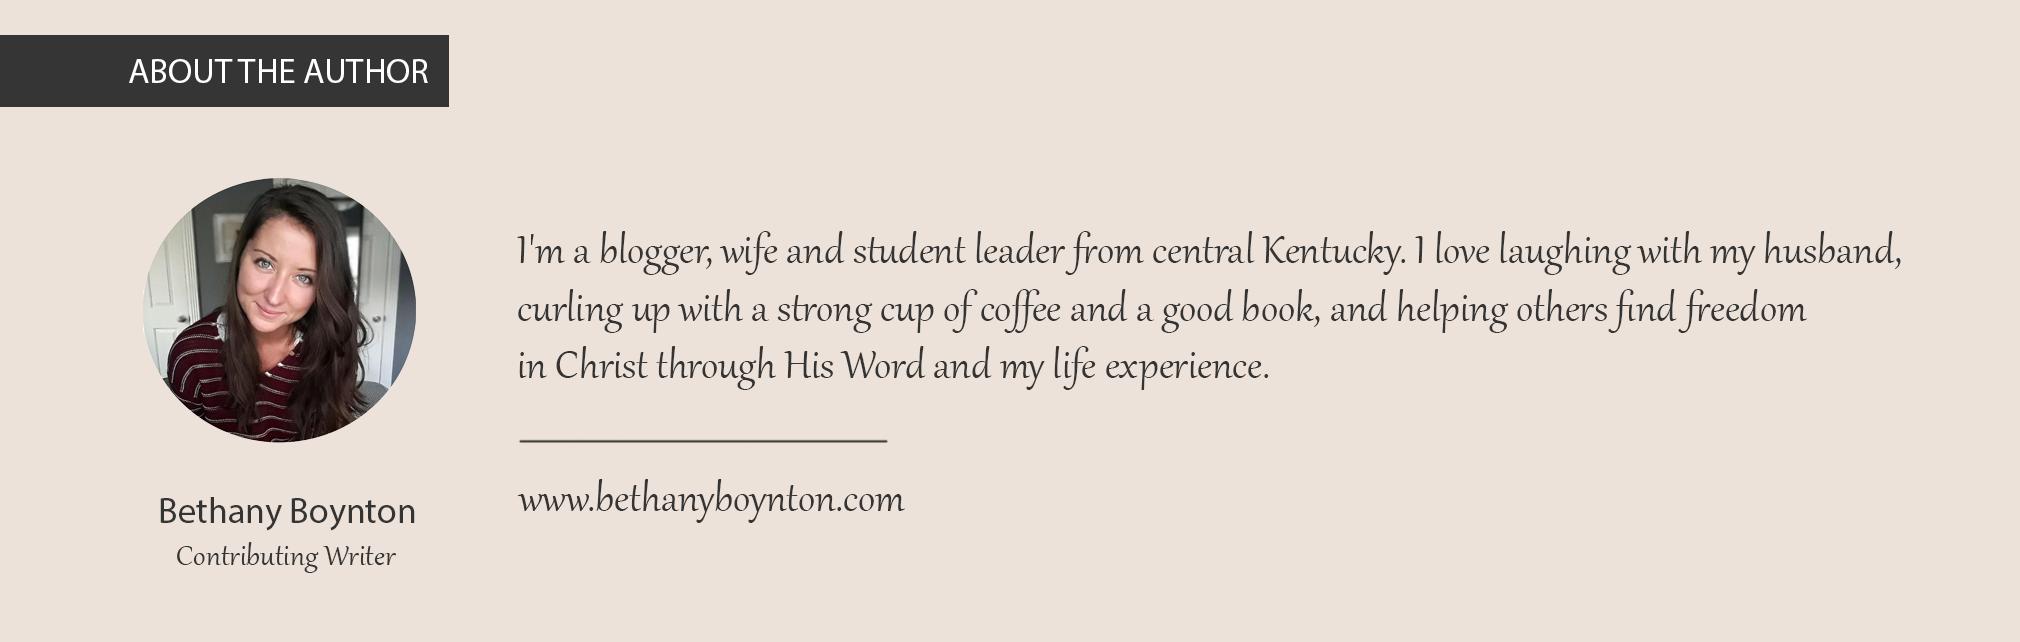 Bethany Boynton bio.png